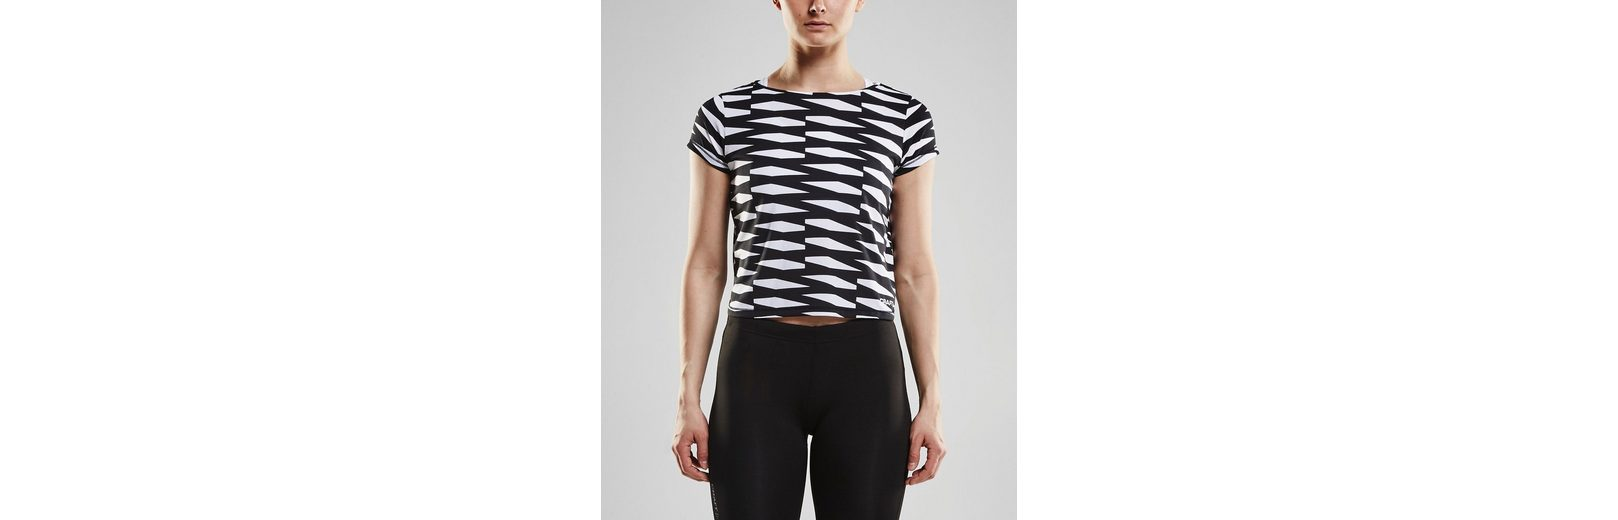 Craft T-Shirt Breakaway Short Tee Women Pay Online Mit Visa-Verkauf mb6Xz8